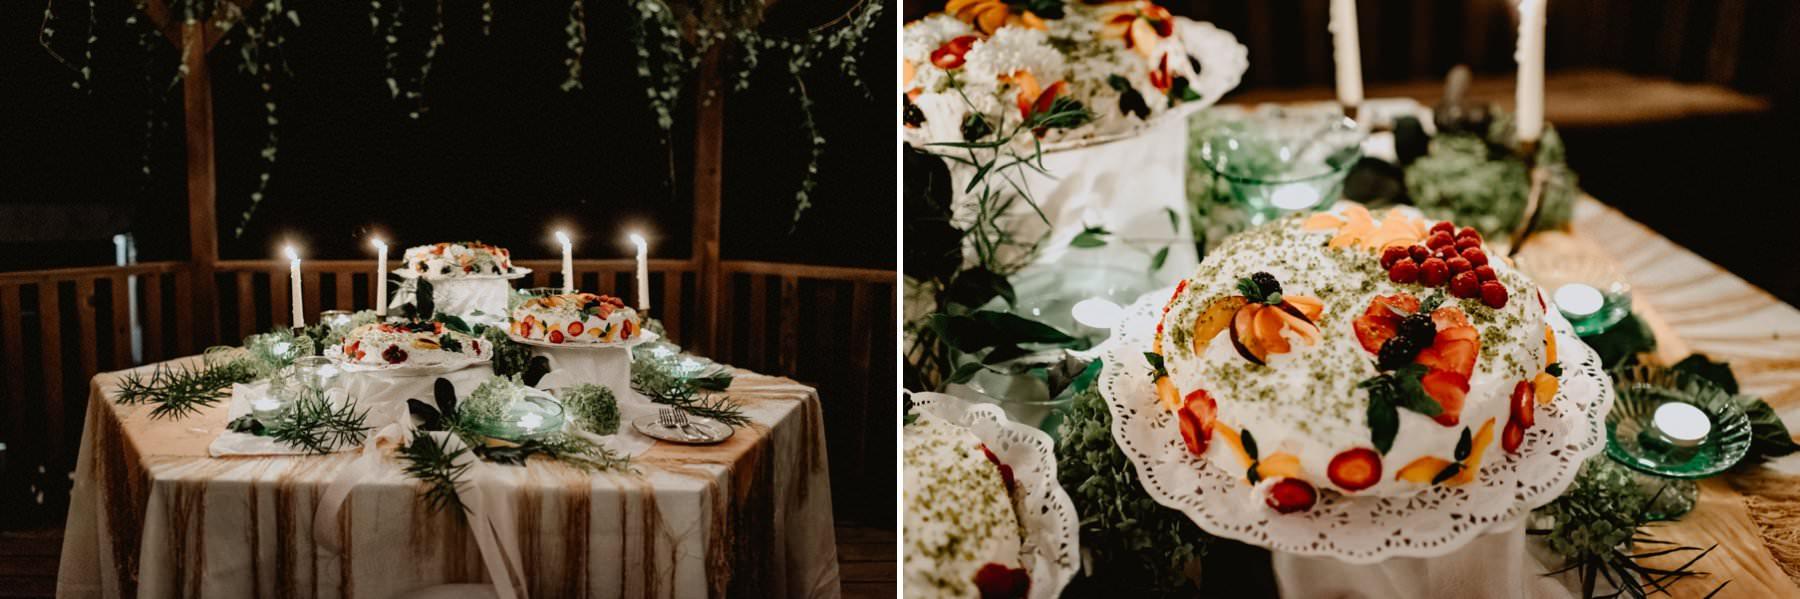 pennsylvania-private-estate-wedding-143.jpg